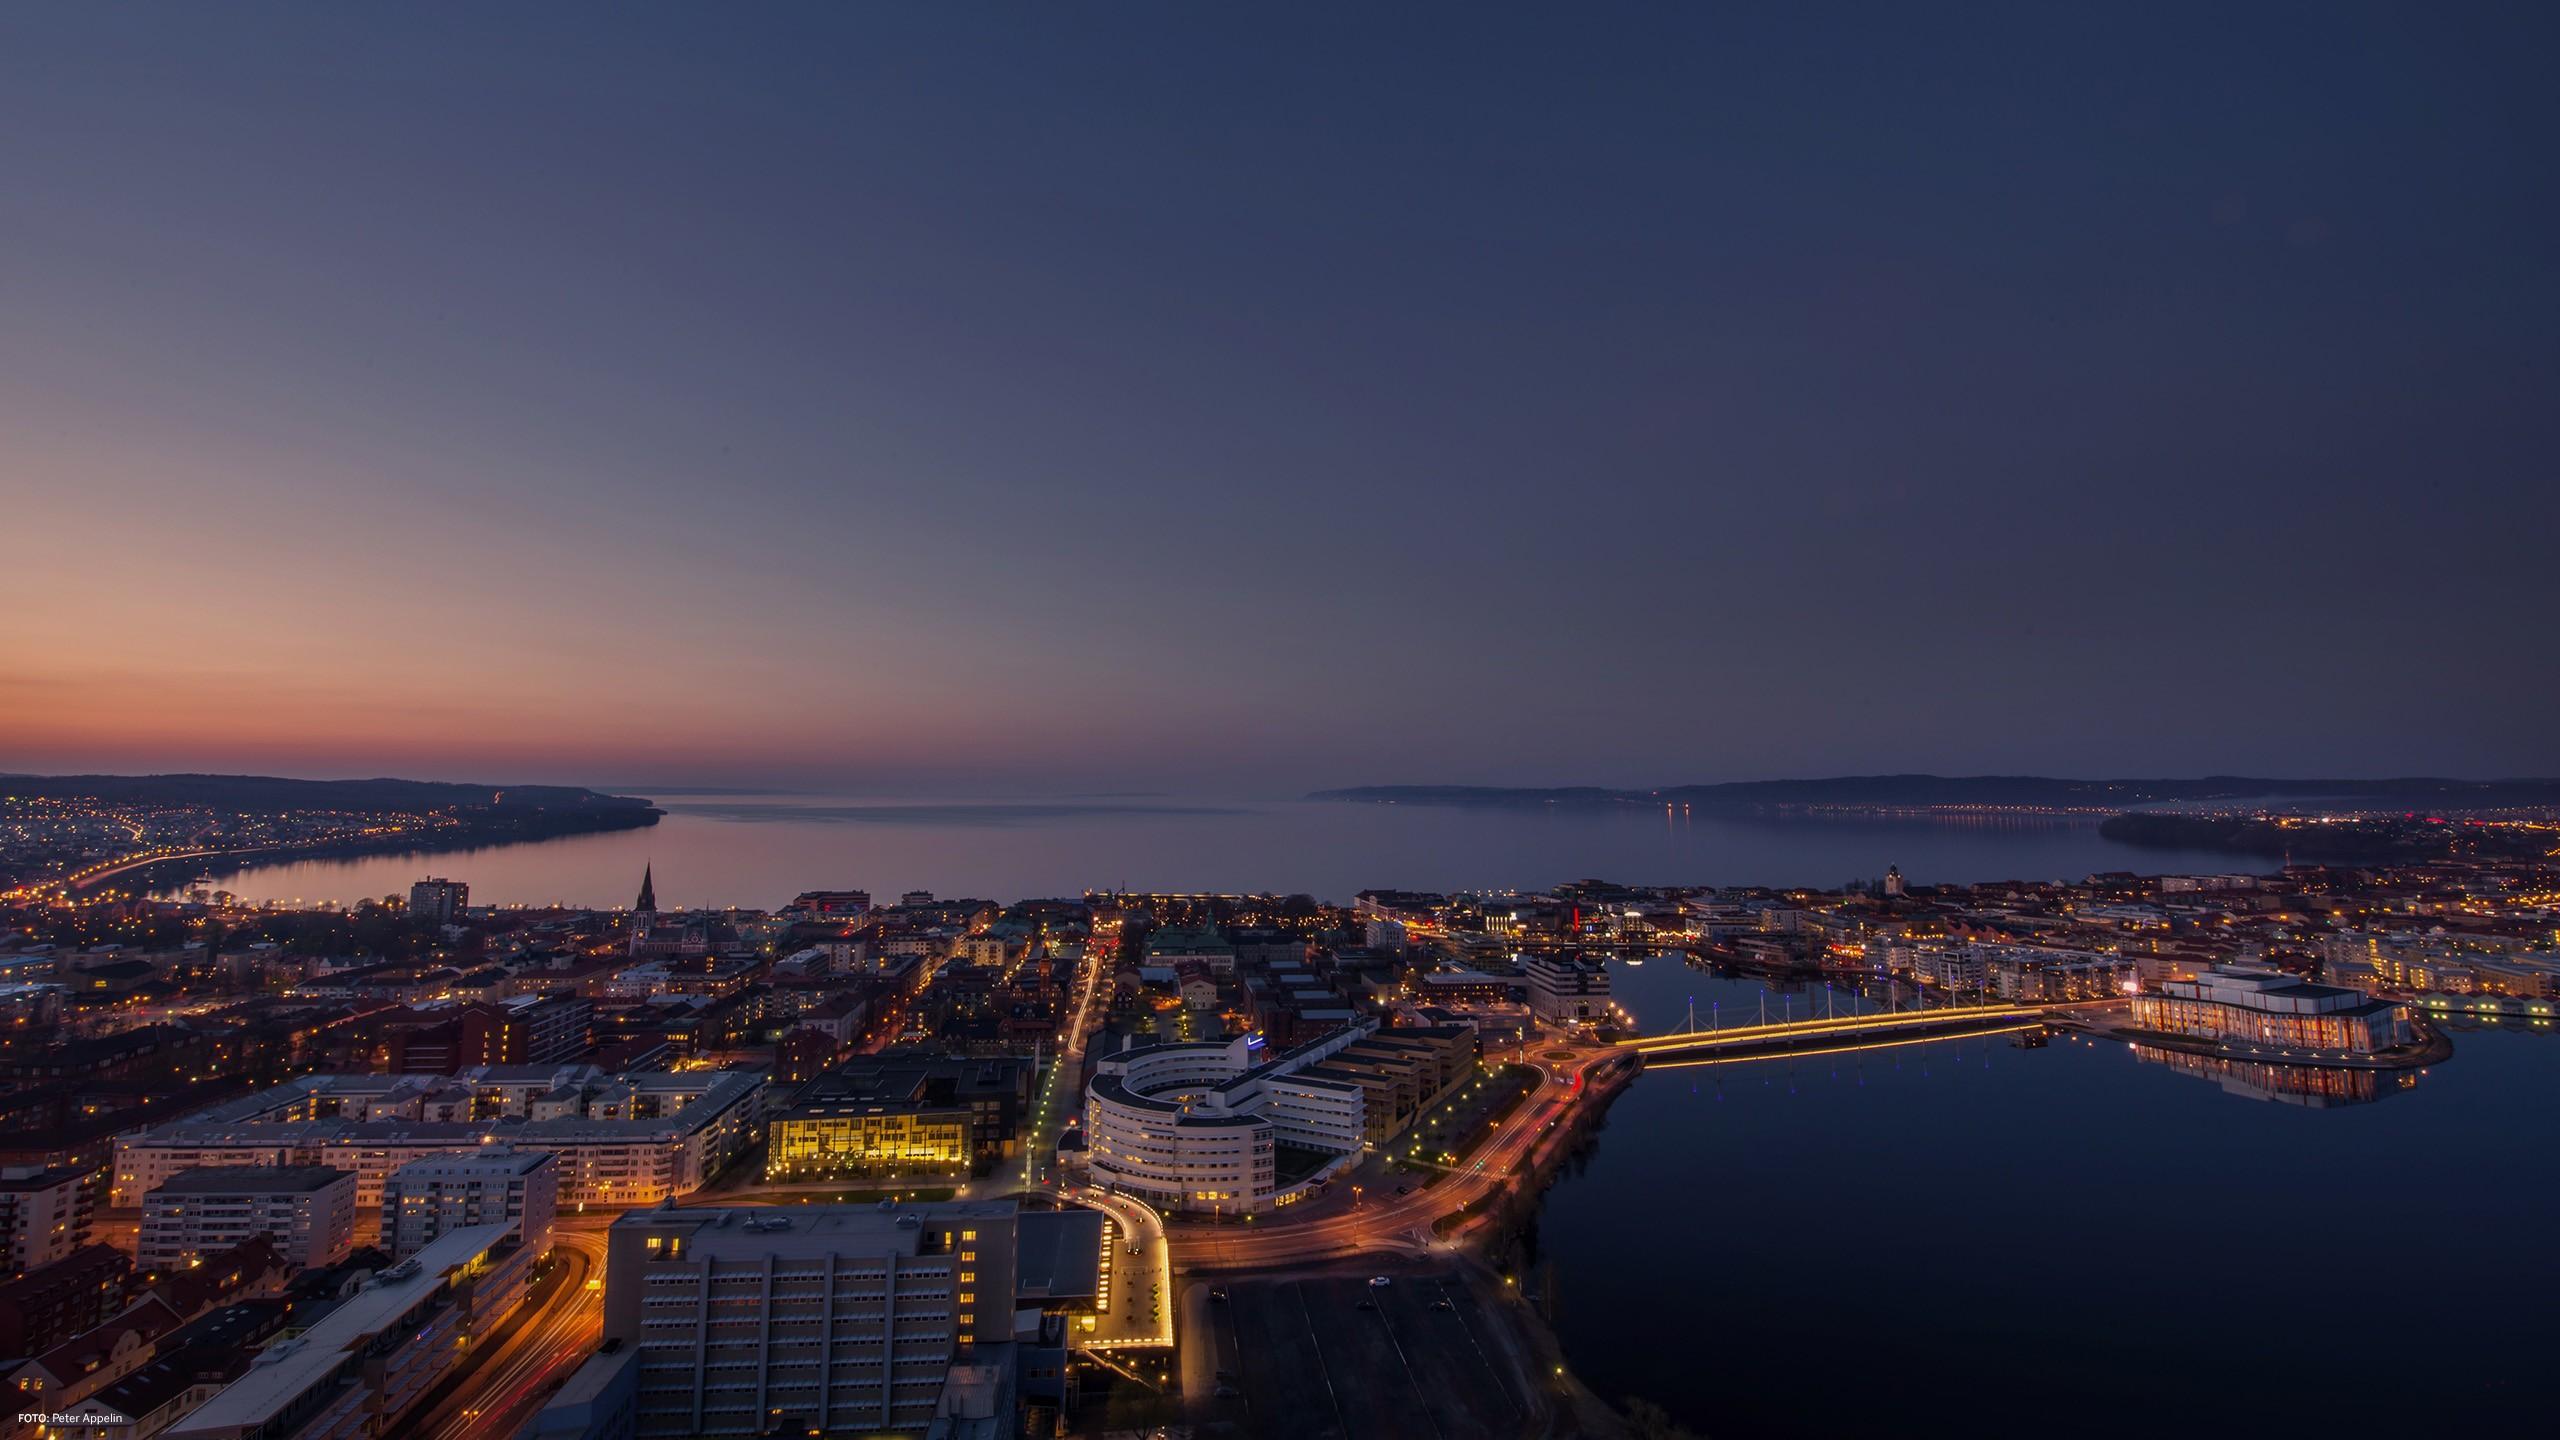 Sveriges största städer - Jönköping